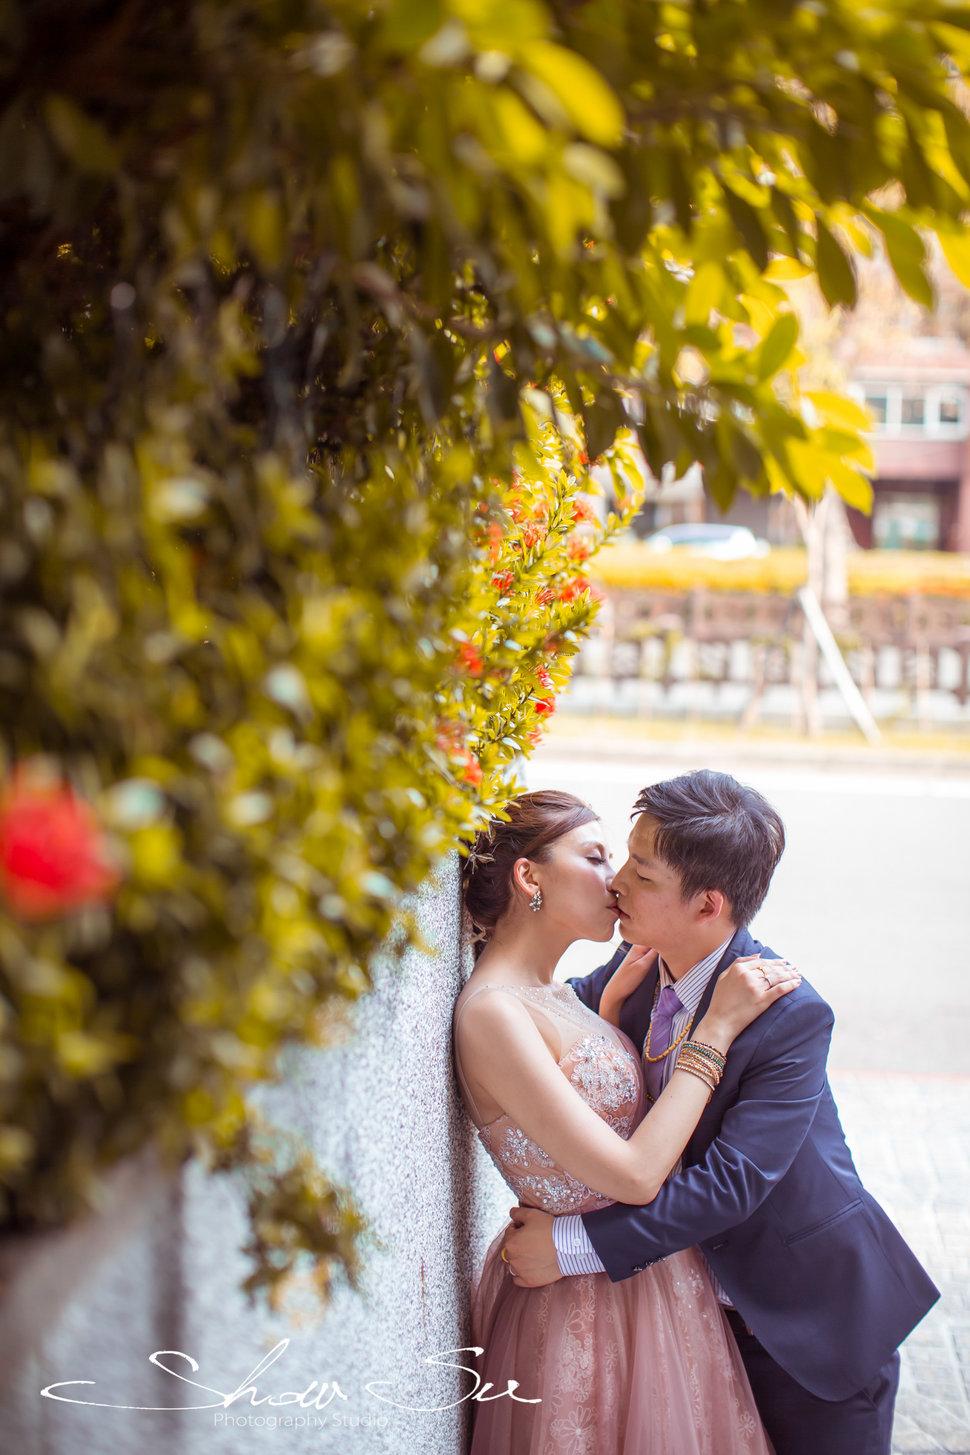 (編號:514033) - Show Su Photography - 結婚吧一站式婚禮服務平台